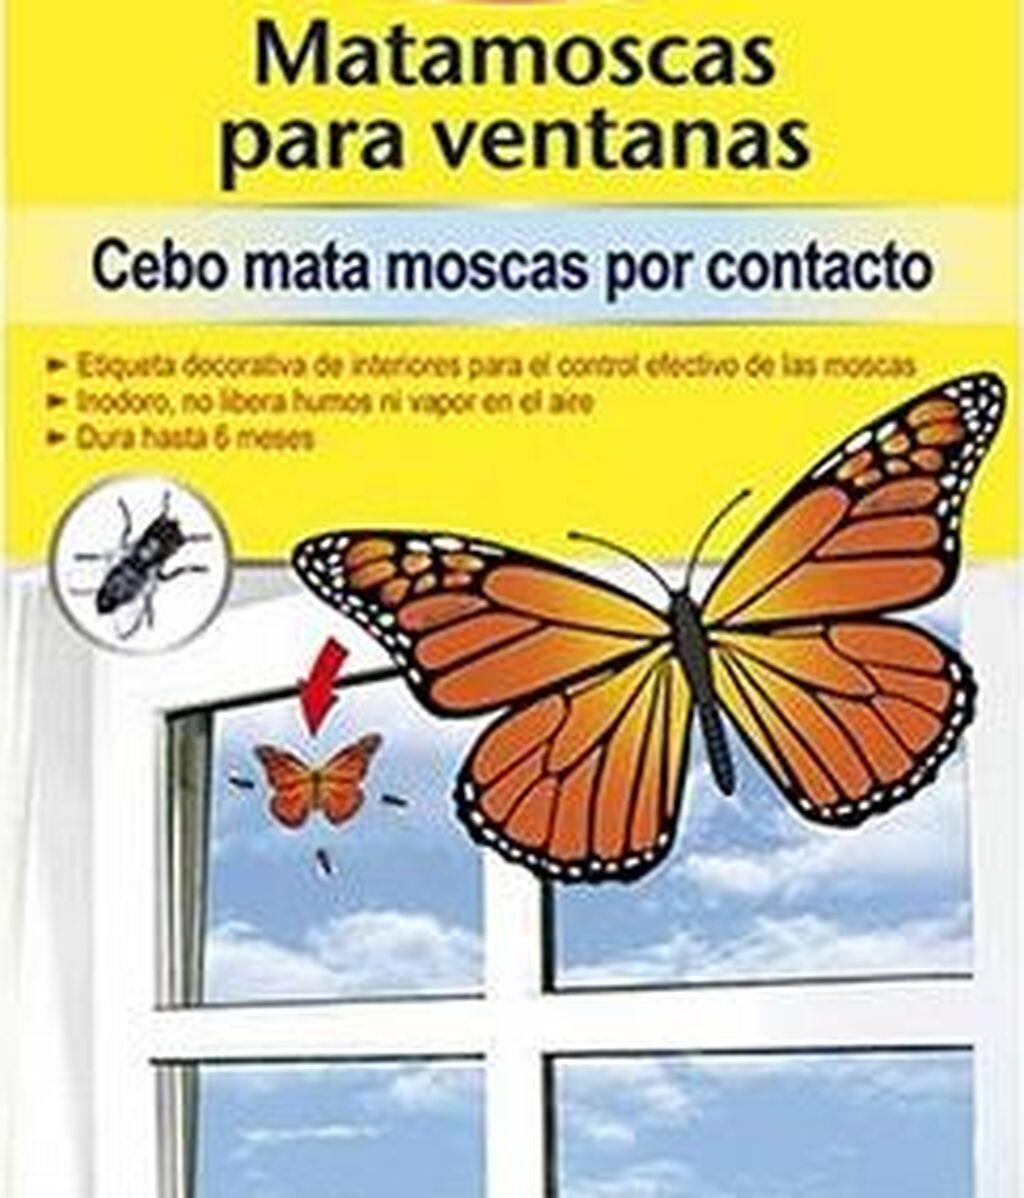 matamoscas mariposa